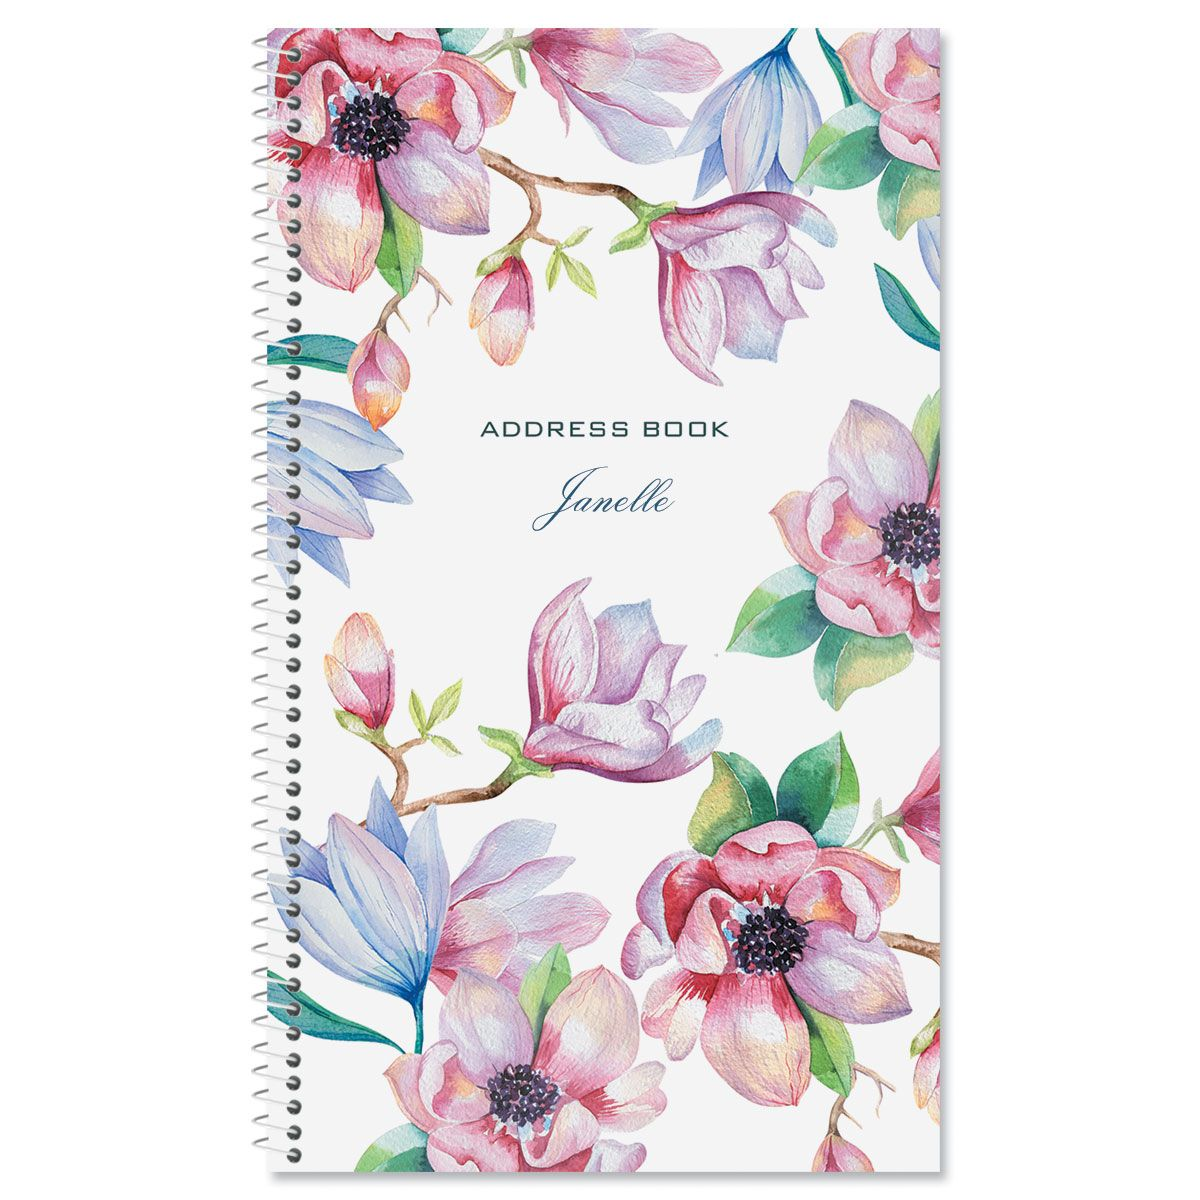 Magnolia Address Book